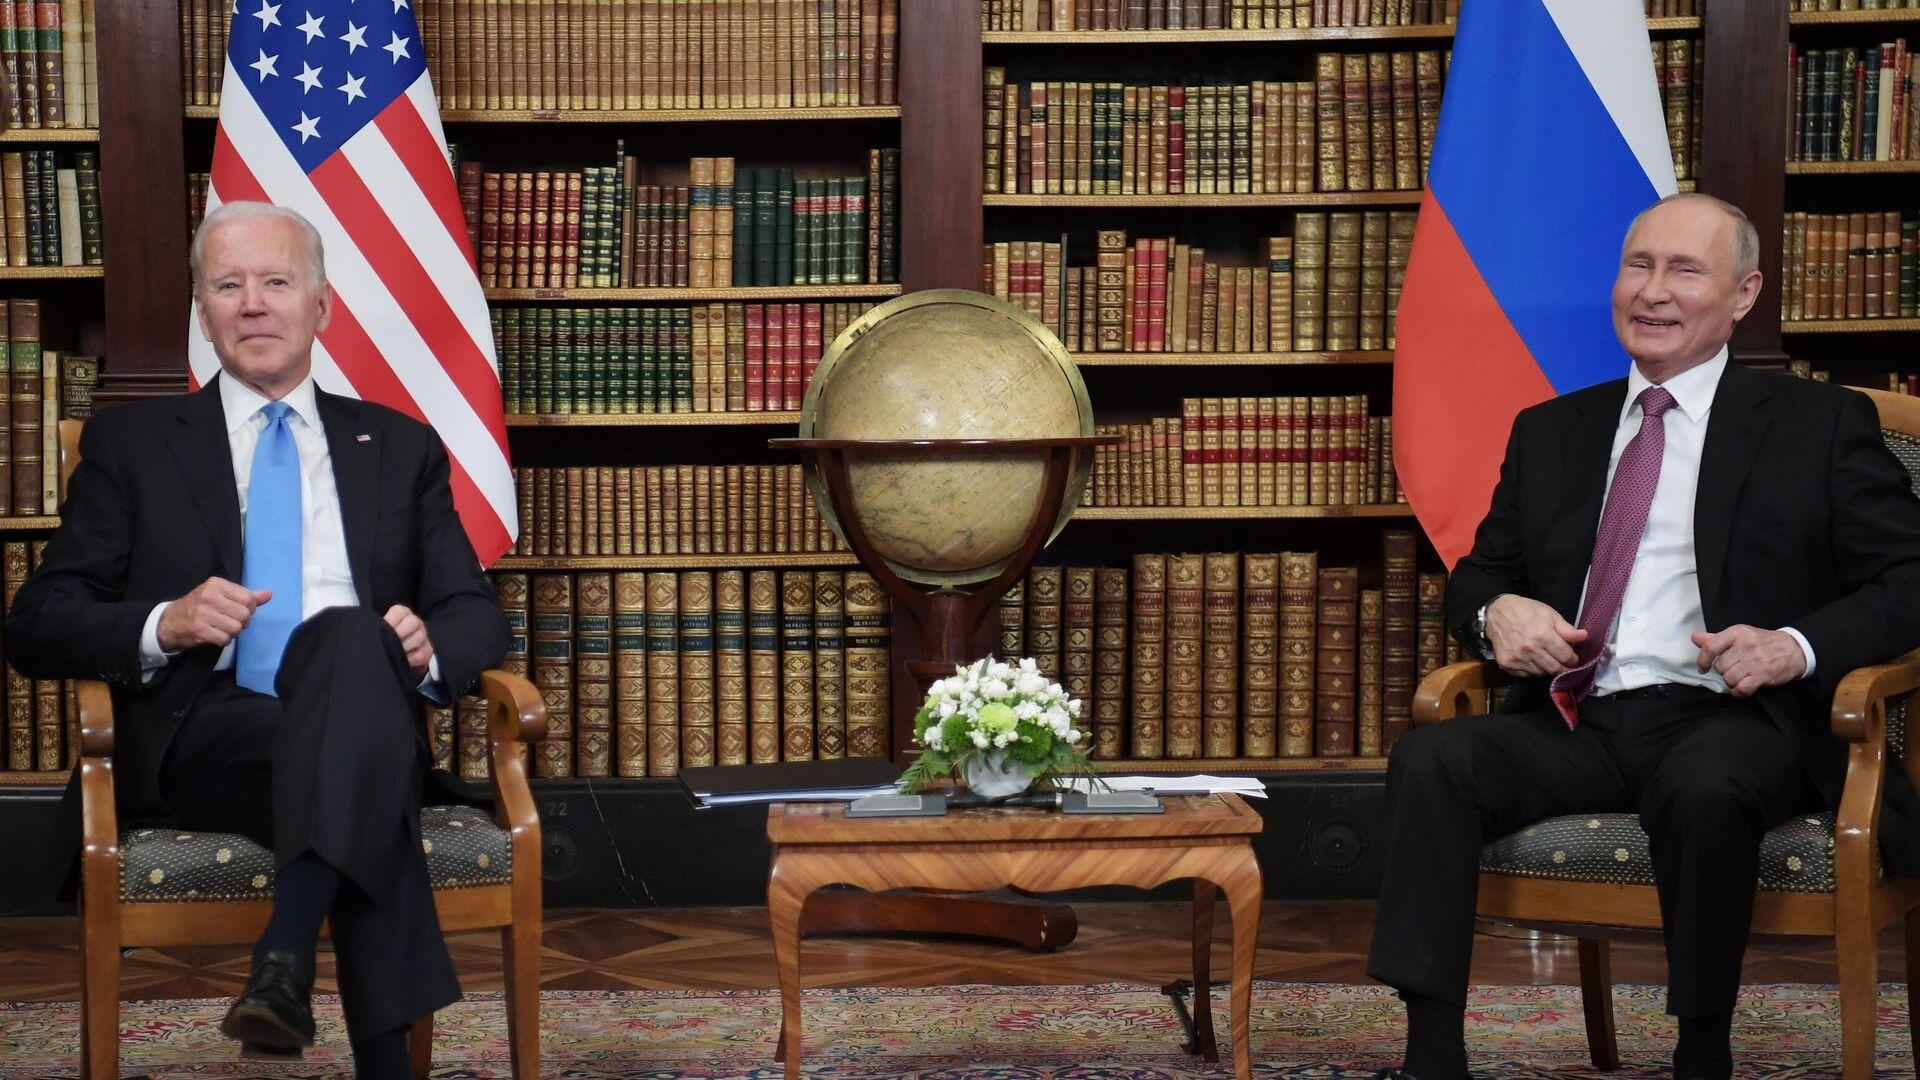 L'incontro bilaterale tra Putin e Biden a Ginevra - Sputnik Italia, 1920, 17.07.2021